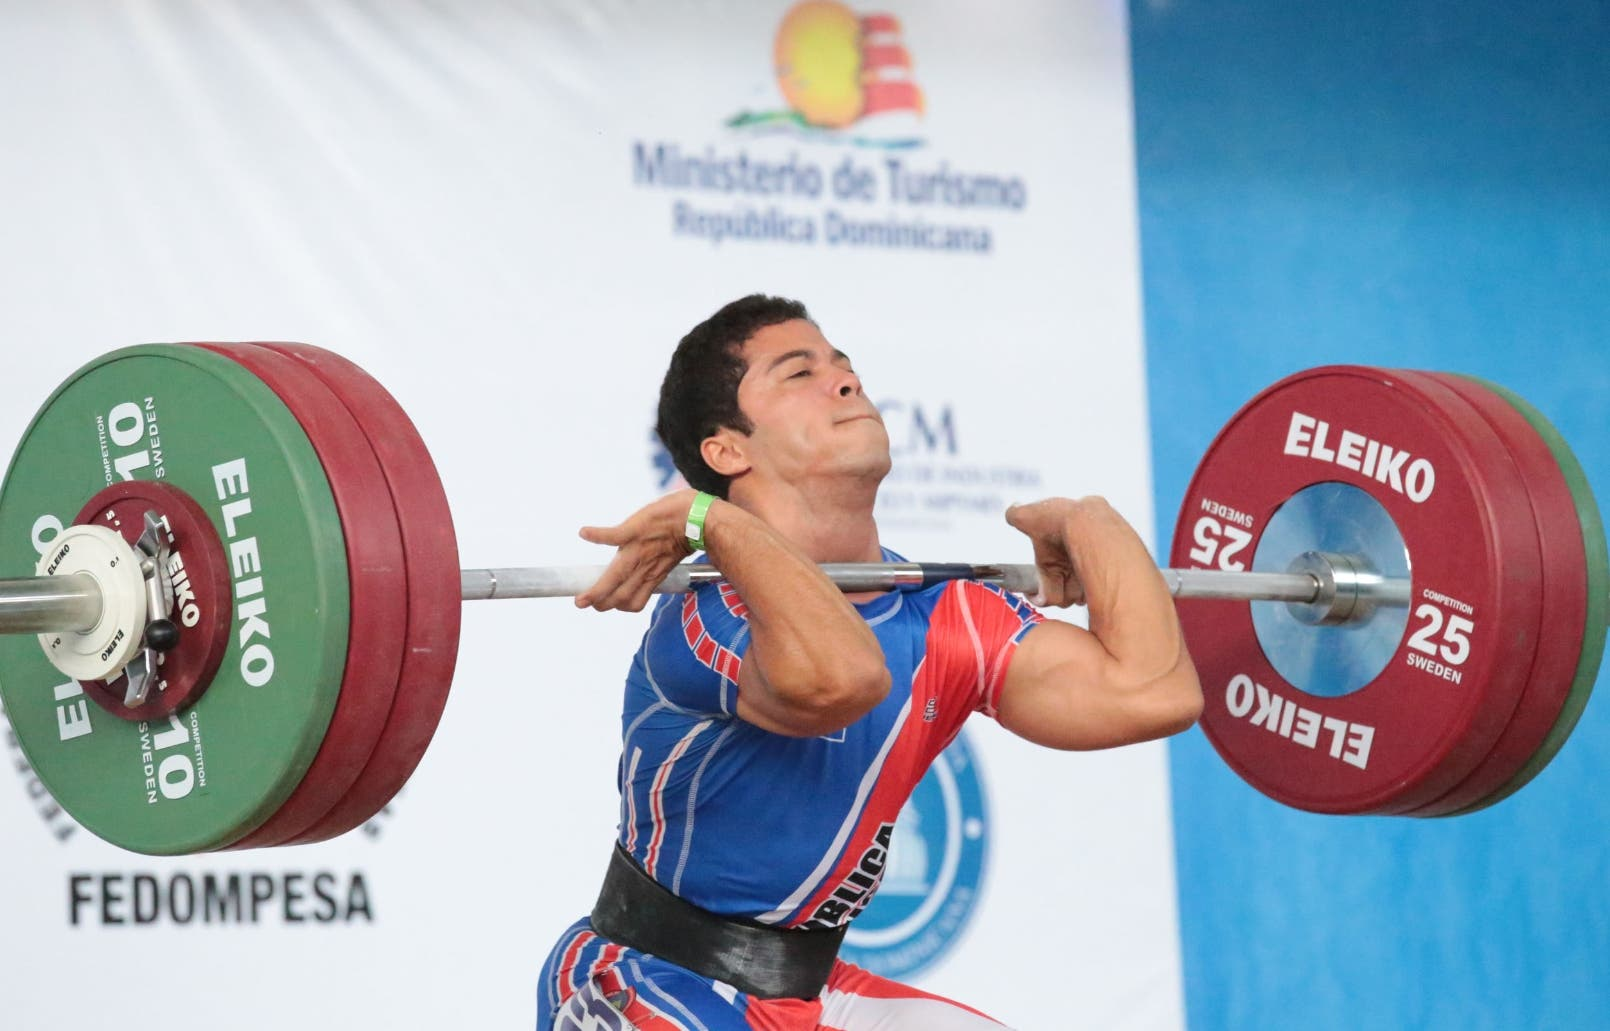 TRES ORO Silvestre ganó plata en Panam Pesas — GARCÍA